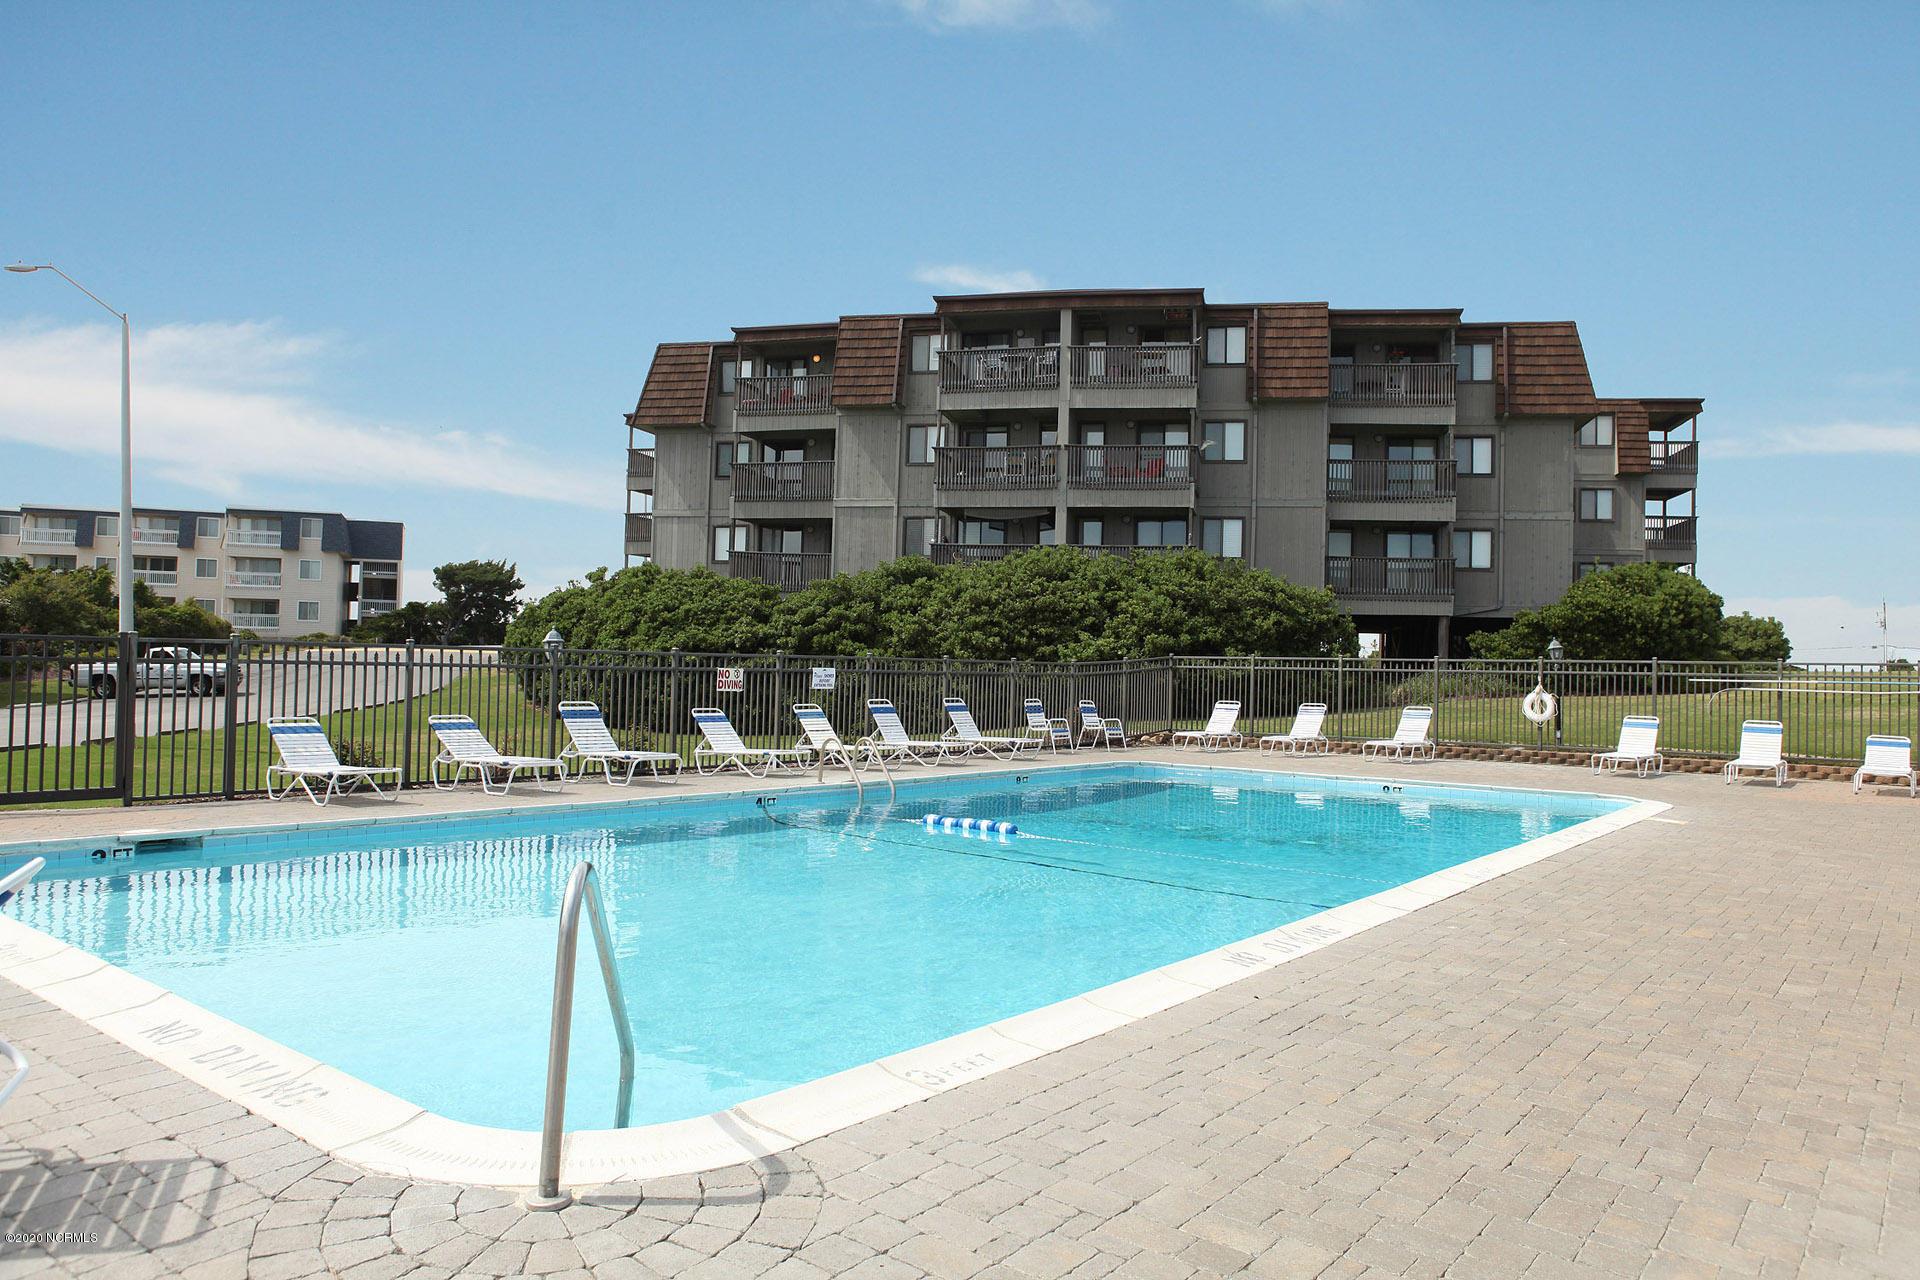 2008 Fort Macon Road, Atlantic Beach, North Carolina 28512, 2 Bedrooms Bedrooms, 4 Rooms Rooms,2 BathroomsBathrooms,Condominium,For sale,Fort Macon,100218818